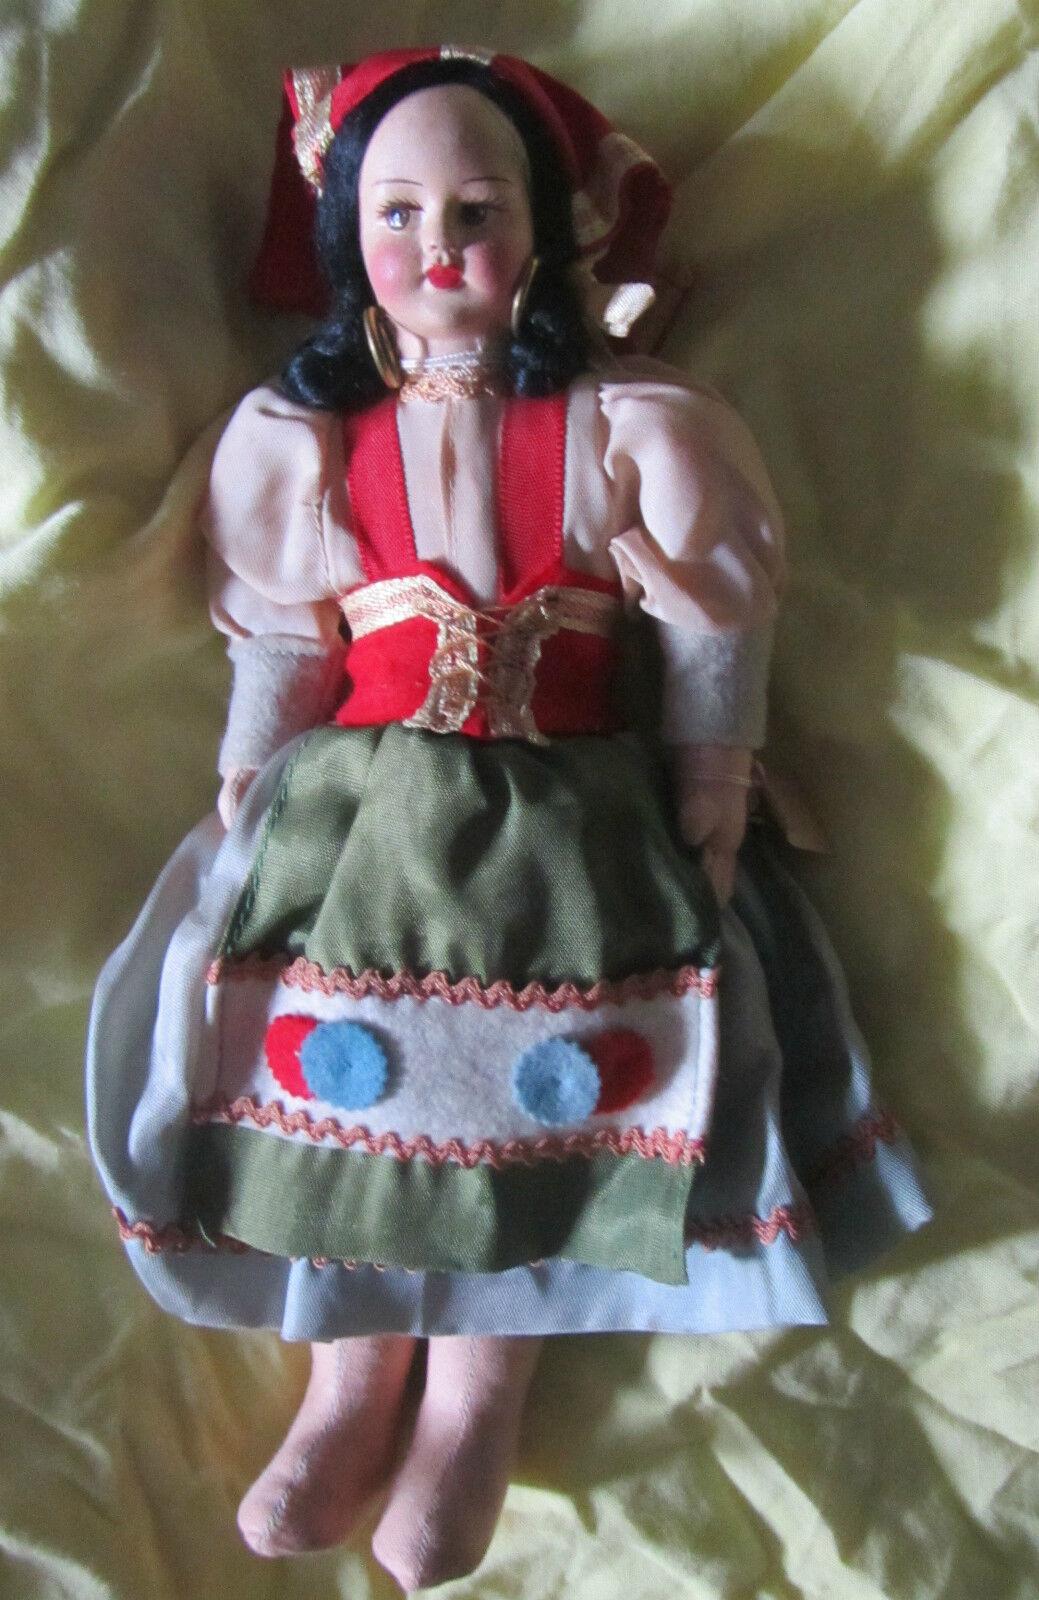 Puppe Vintage Napoli Dunkel Merkmale, Stoff, Stoff, Merkmale, Komposition, Ethnisch Look Great aa3e67